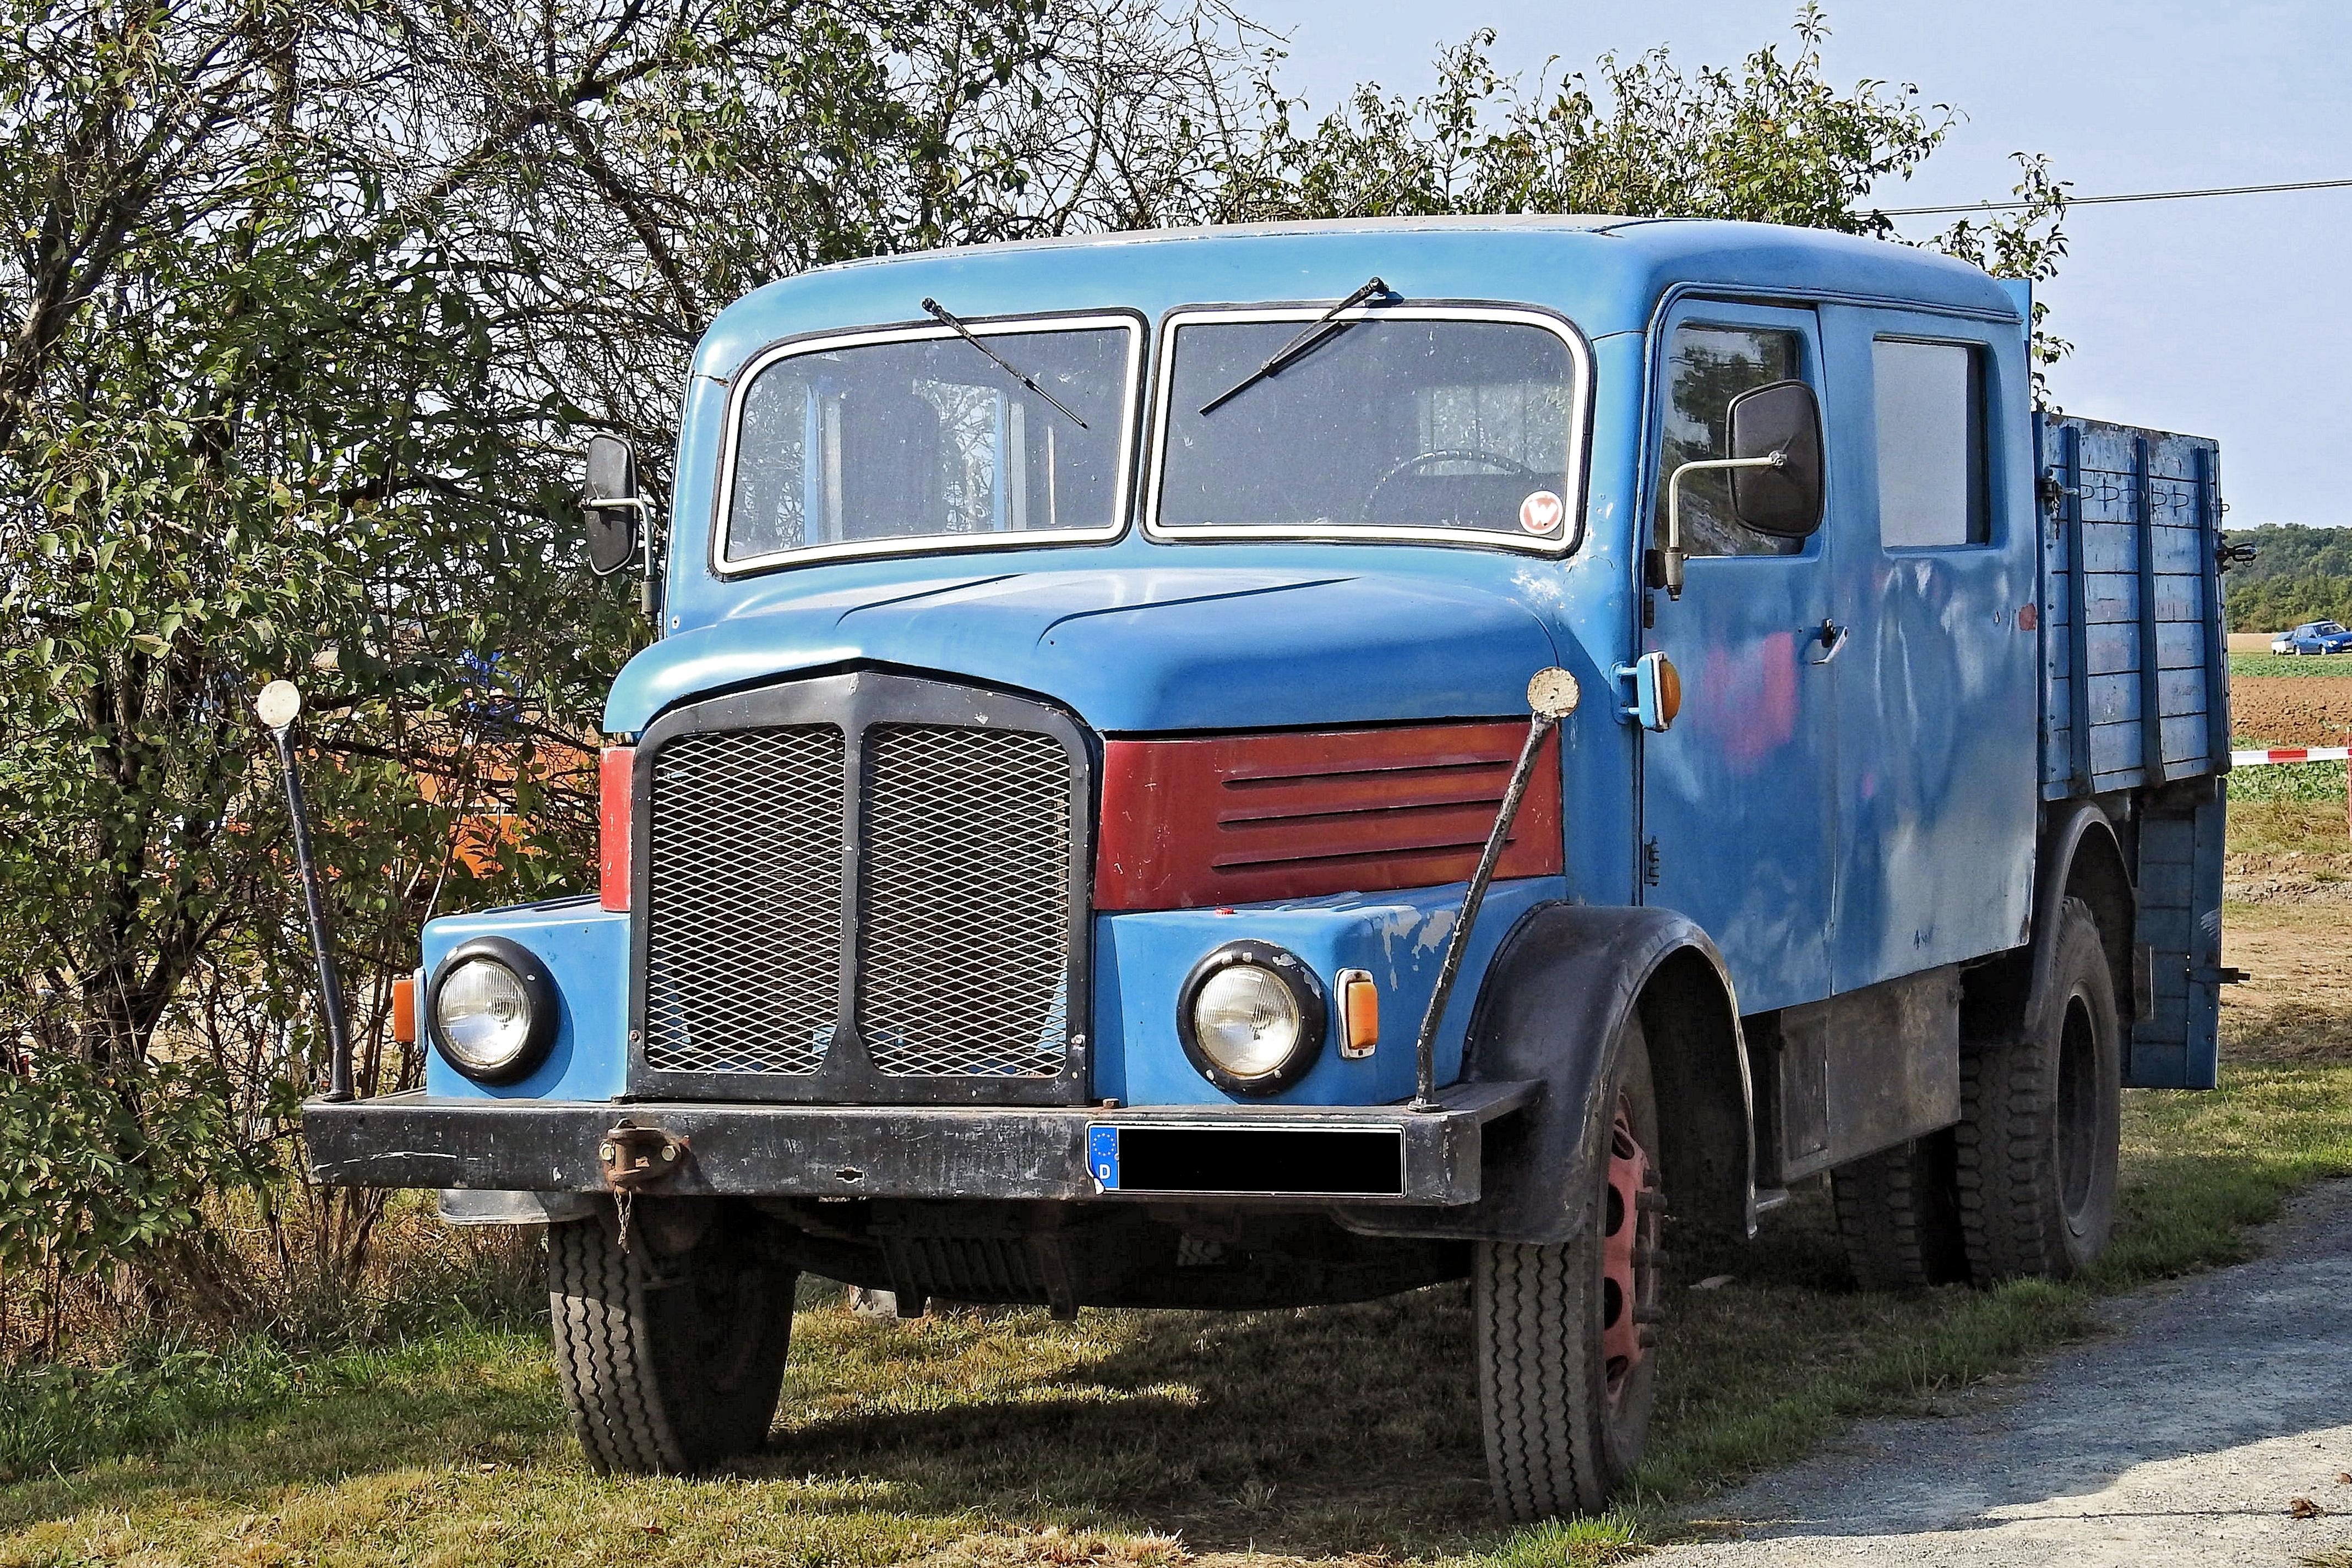 Free Images : old, transport, motor vehicle, oldtimer, historically ...